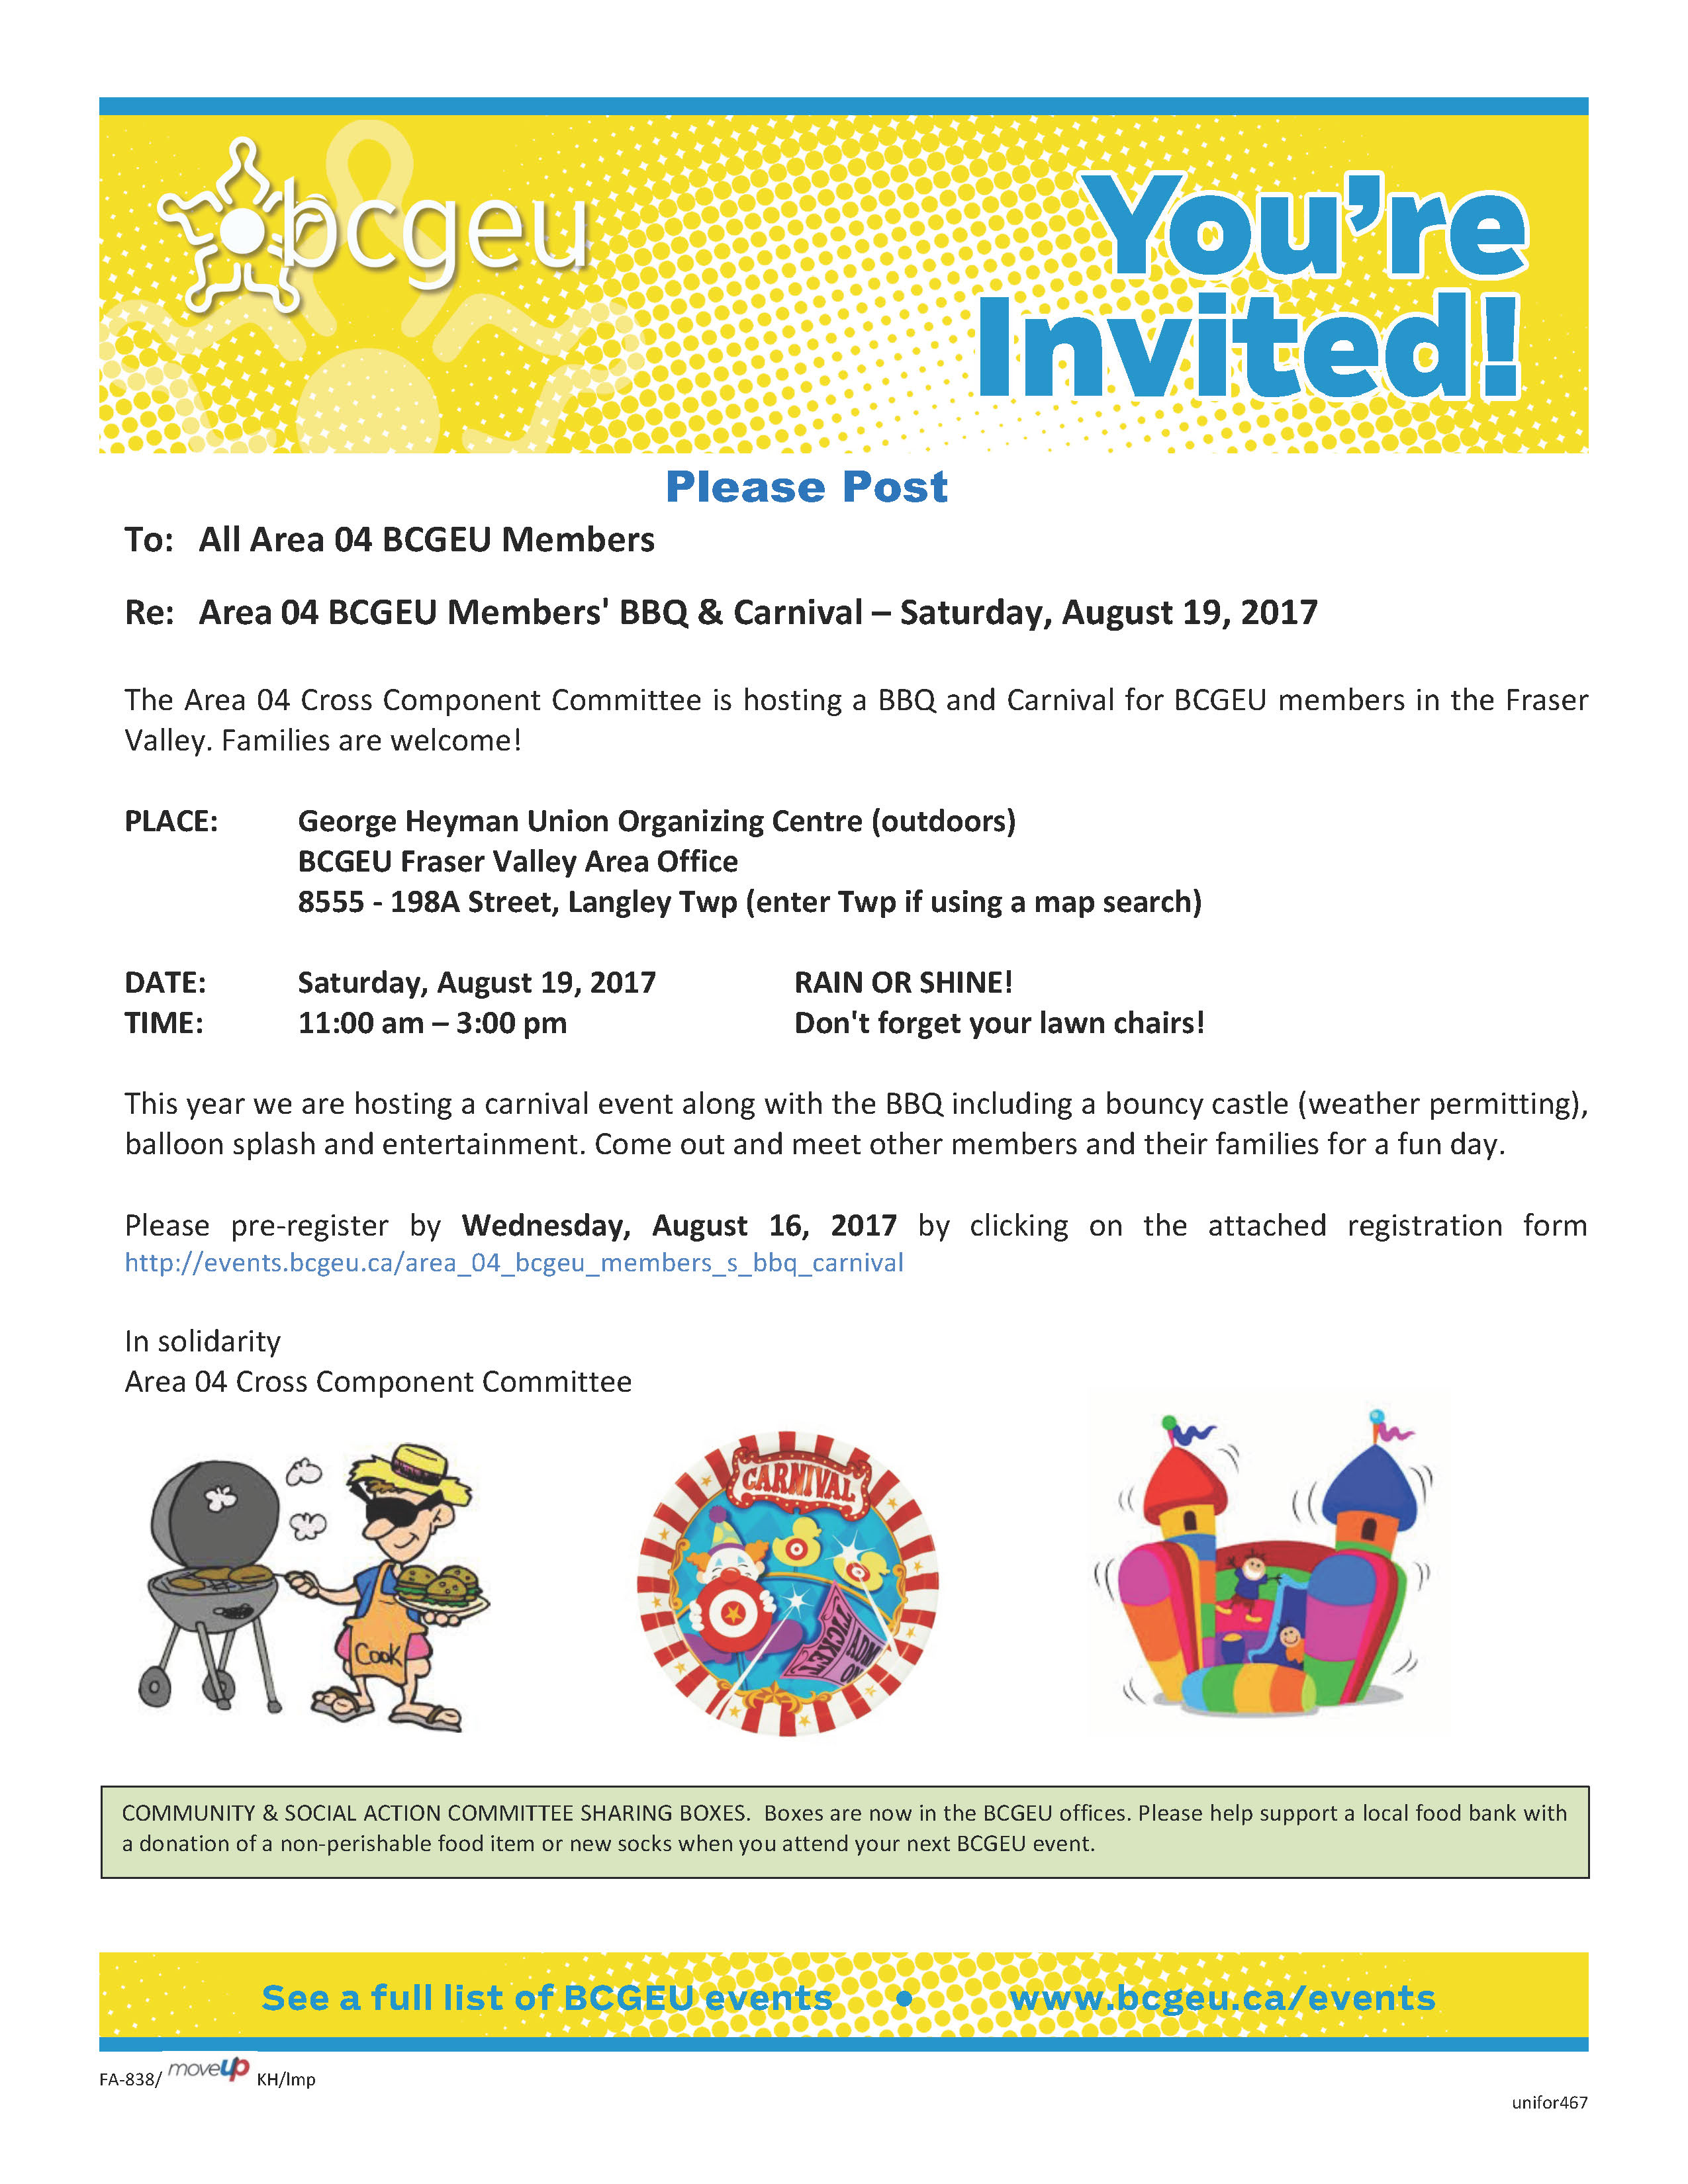 bbq_invite_2017.jpg